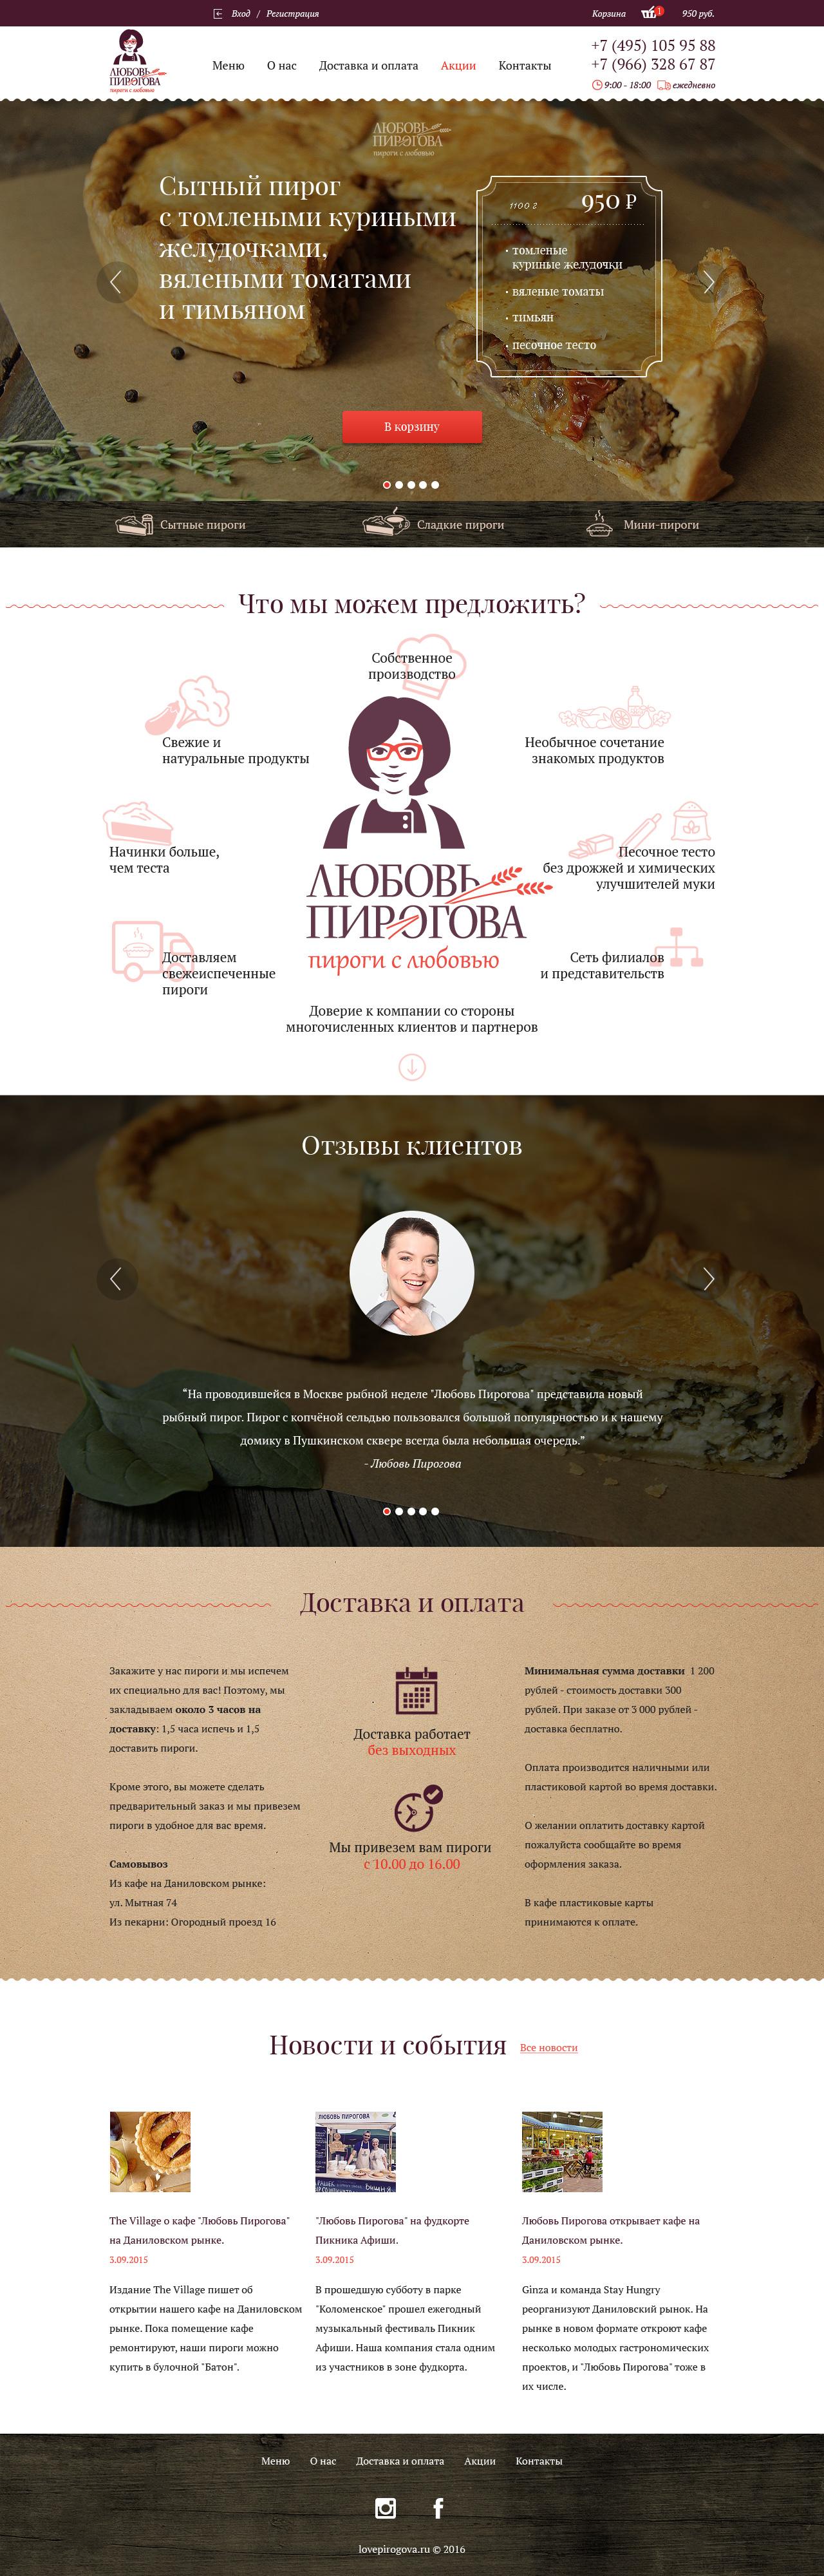 Разработка дизайна сайта lovepirogova.ru фото f_88056b7723e0bd94.jpg